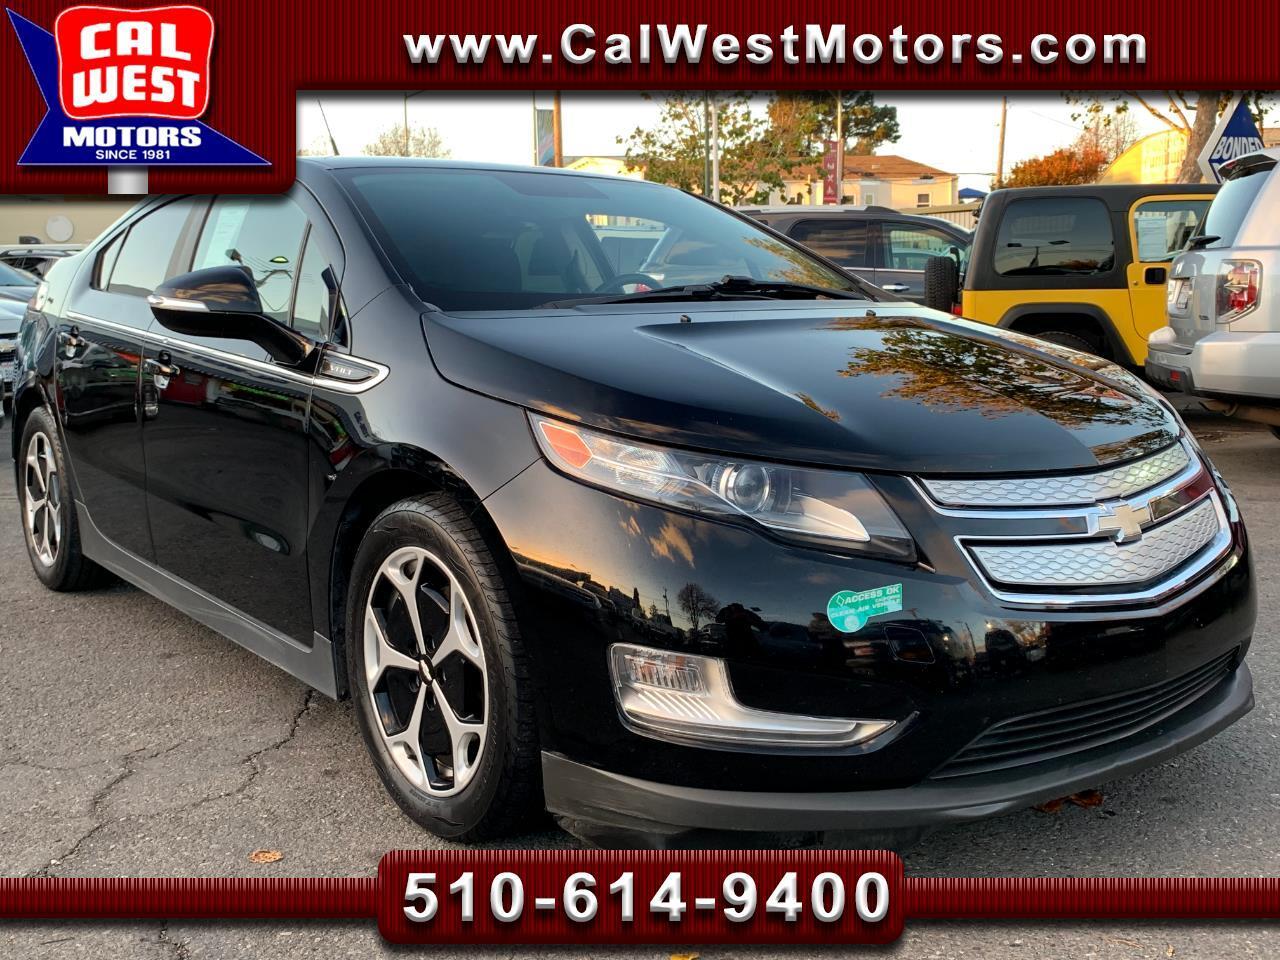 2013 Chevrolet Volt Voltec Electric Blu2th UnlimitedRange SuperClean